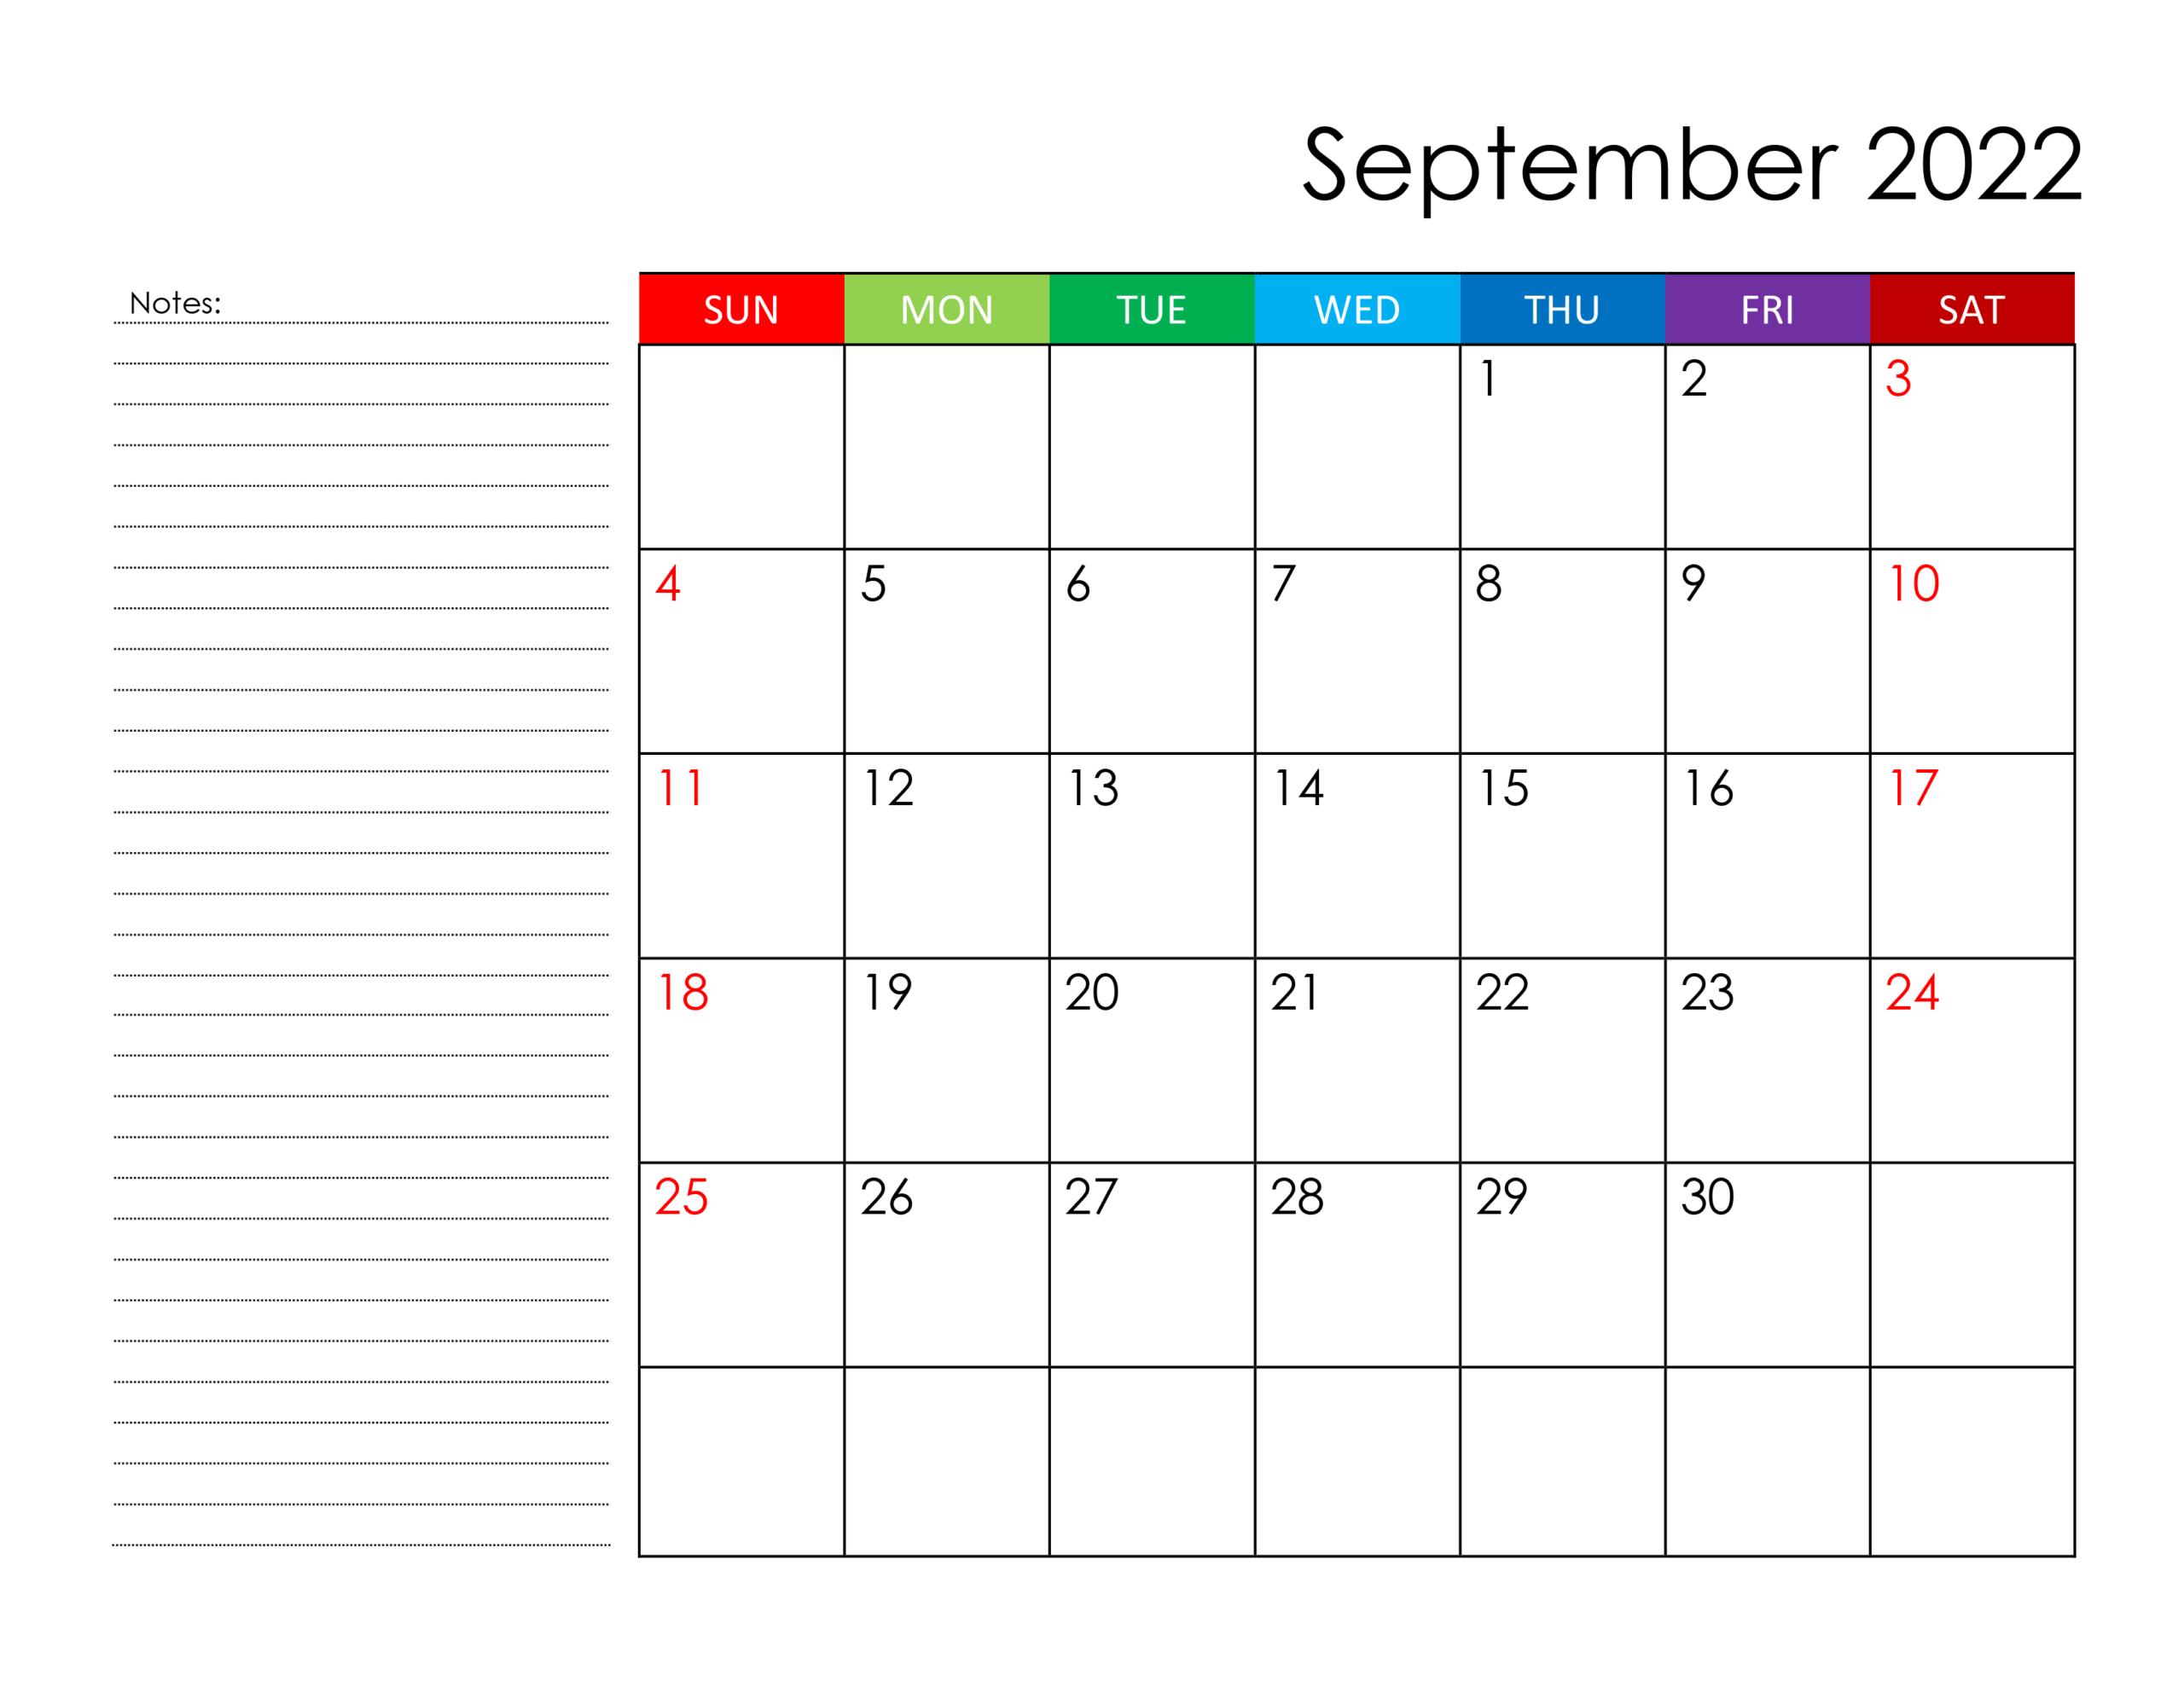 Calendar For September 2022 - Free-Calendar.su within Print Month Calendar September 2022 Image